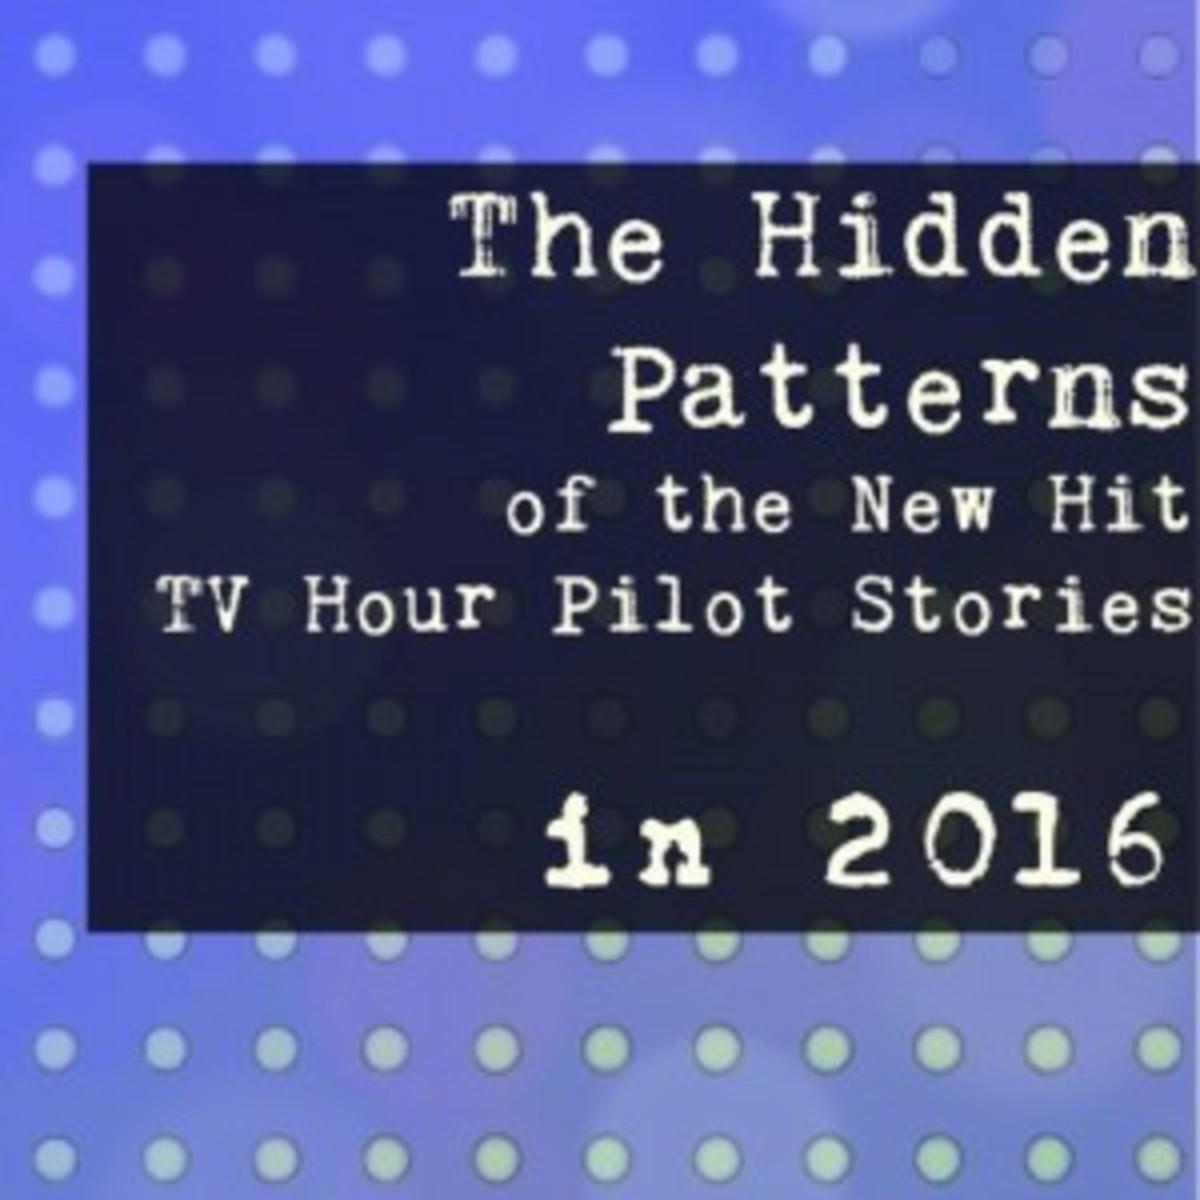 tws-hidden-patterns-500x500_medium